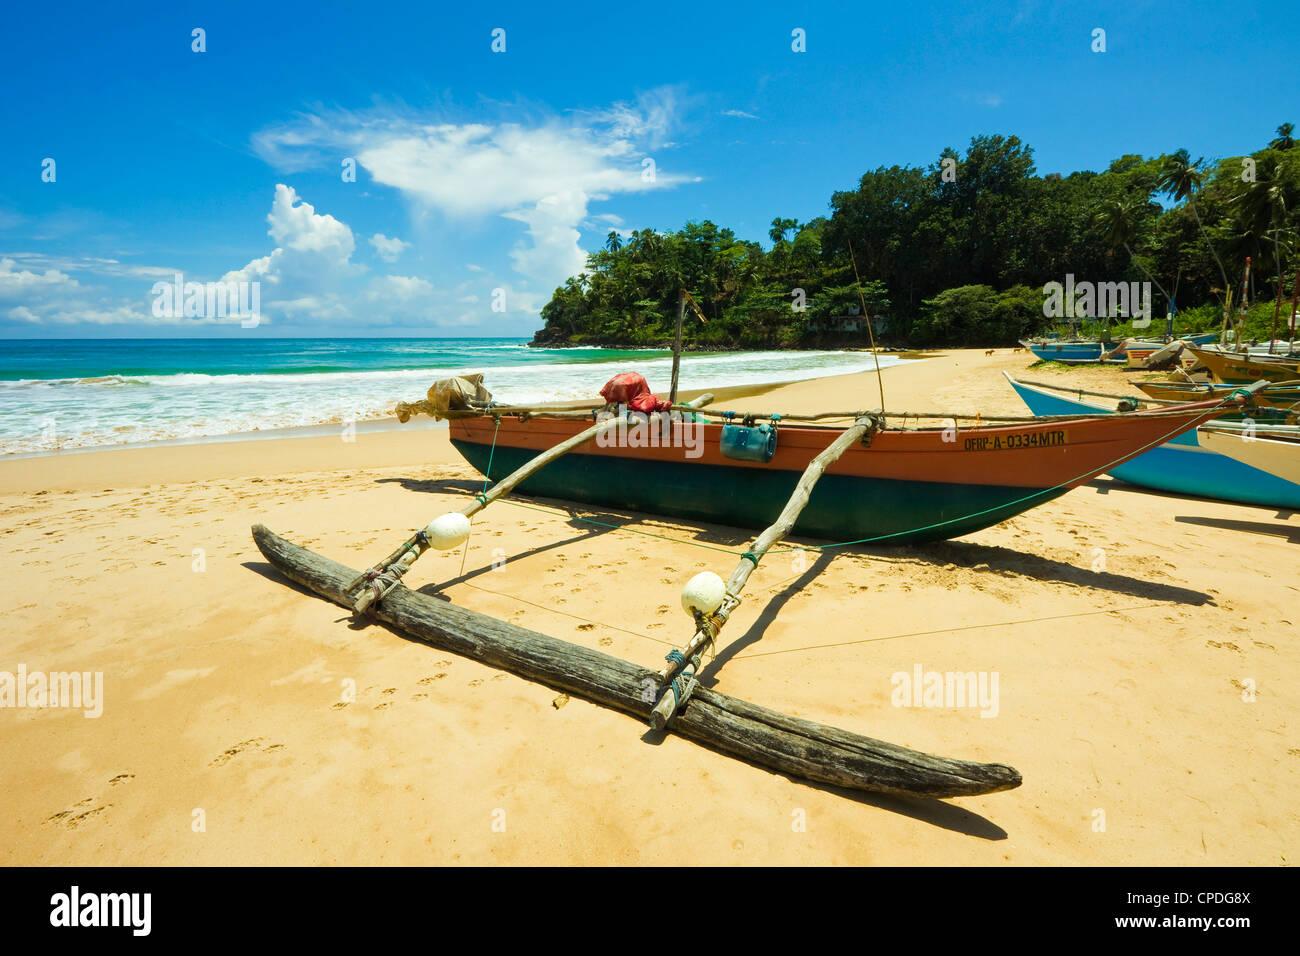 Outrigger botes de pesca en este tranquilo refugio costa sur playa, Talalla, cerca de Matara, la provincia meridional de Sri Lanka, Asia Foto de stock